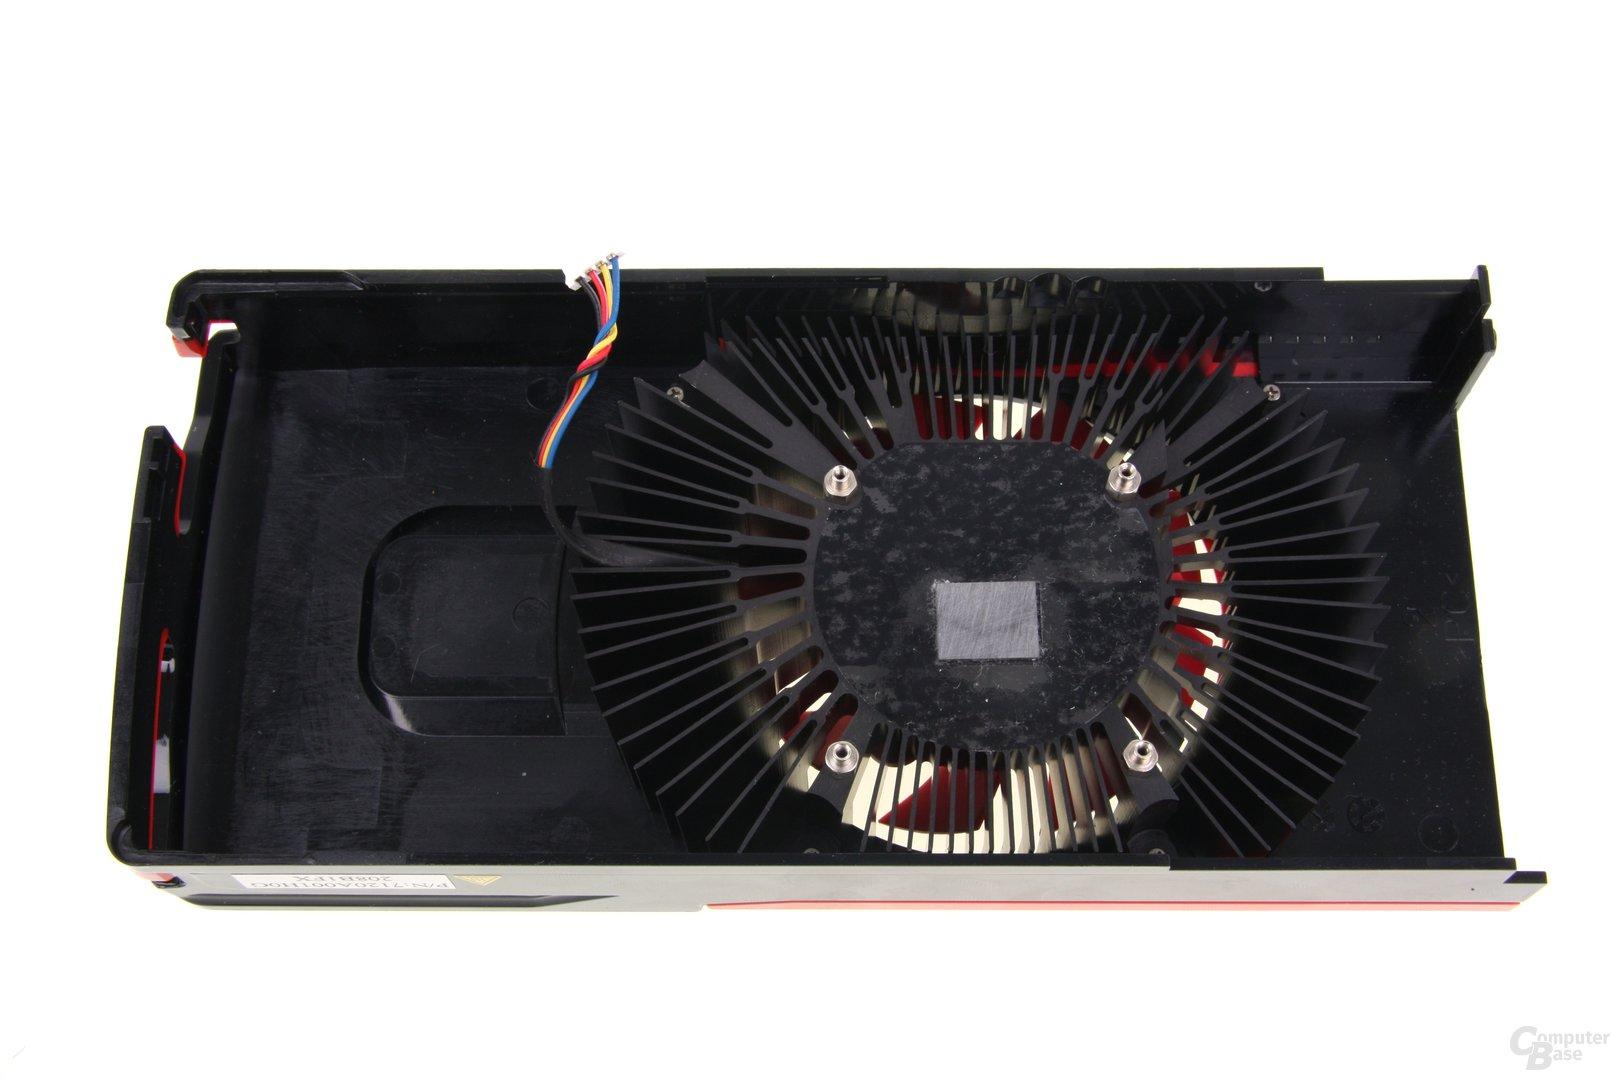 Radeon HD 7750 V2 Kühlerrückseite